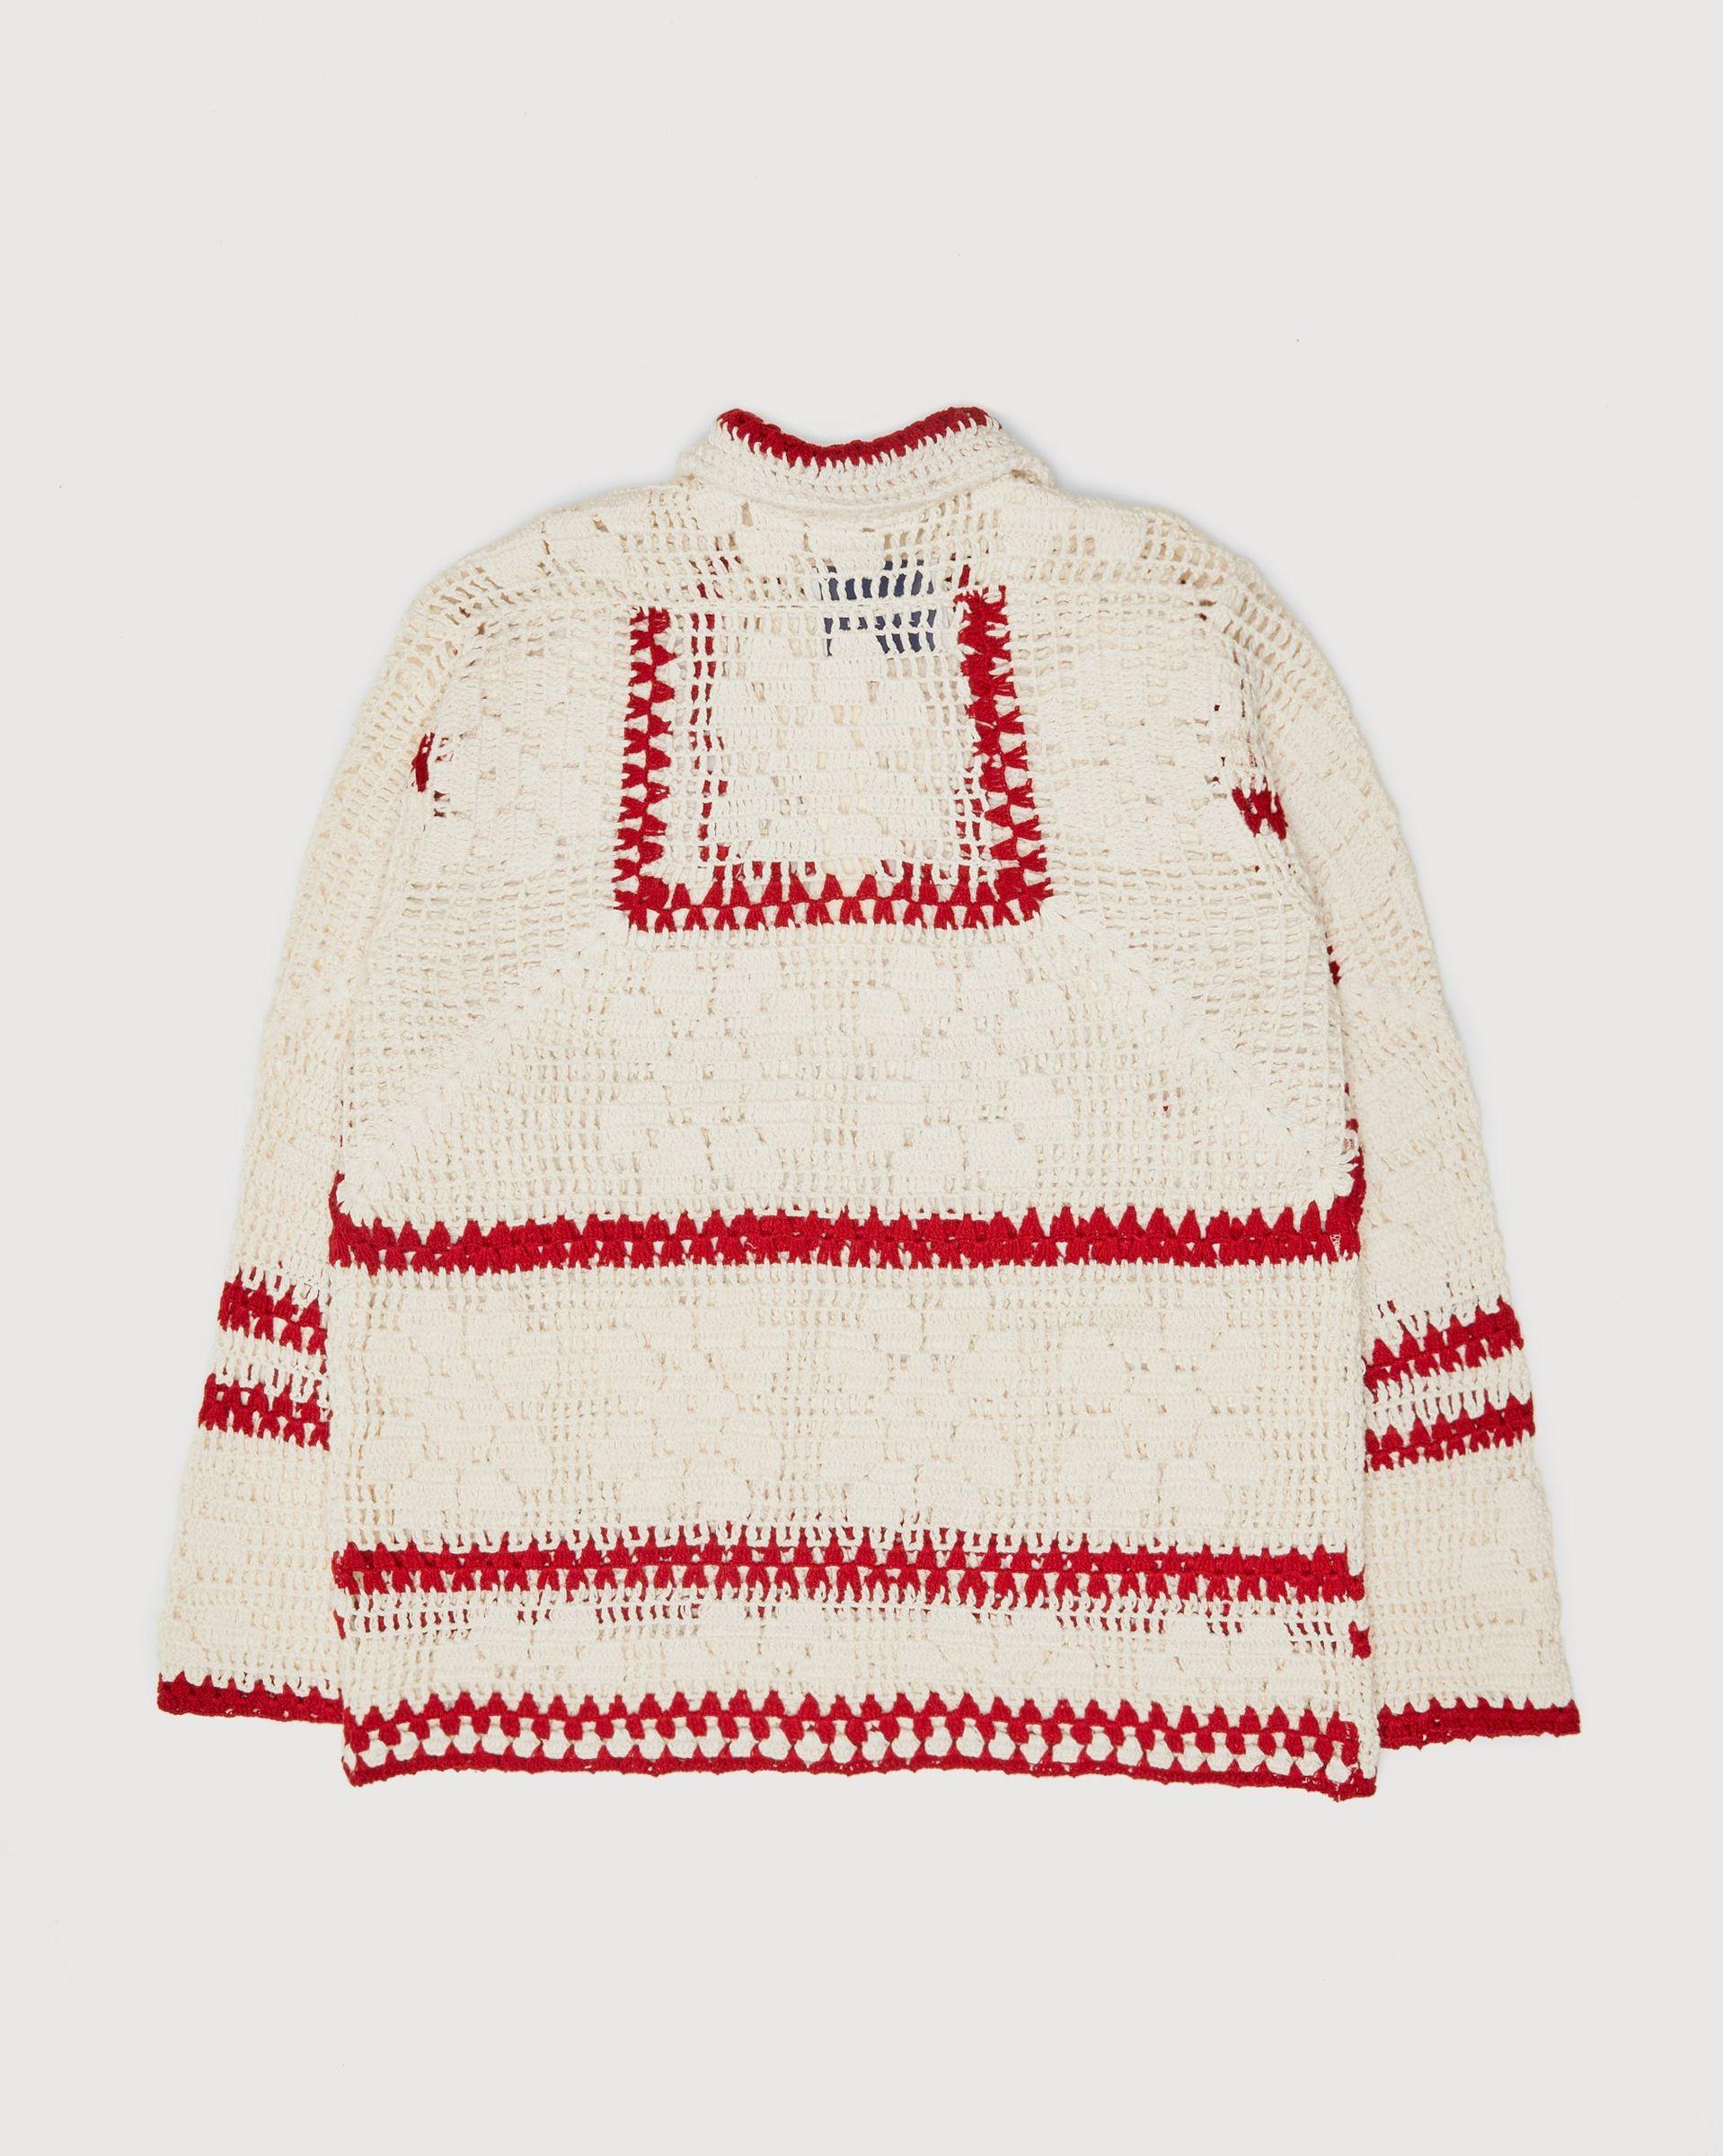 BODE - Mockneck Crochet Pullover White Red - Image 2